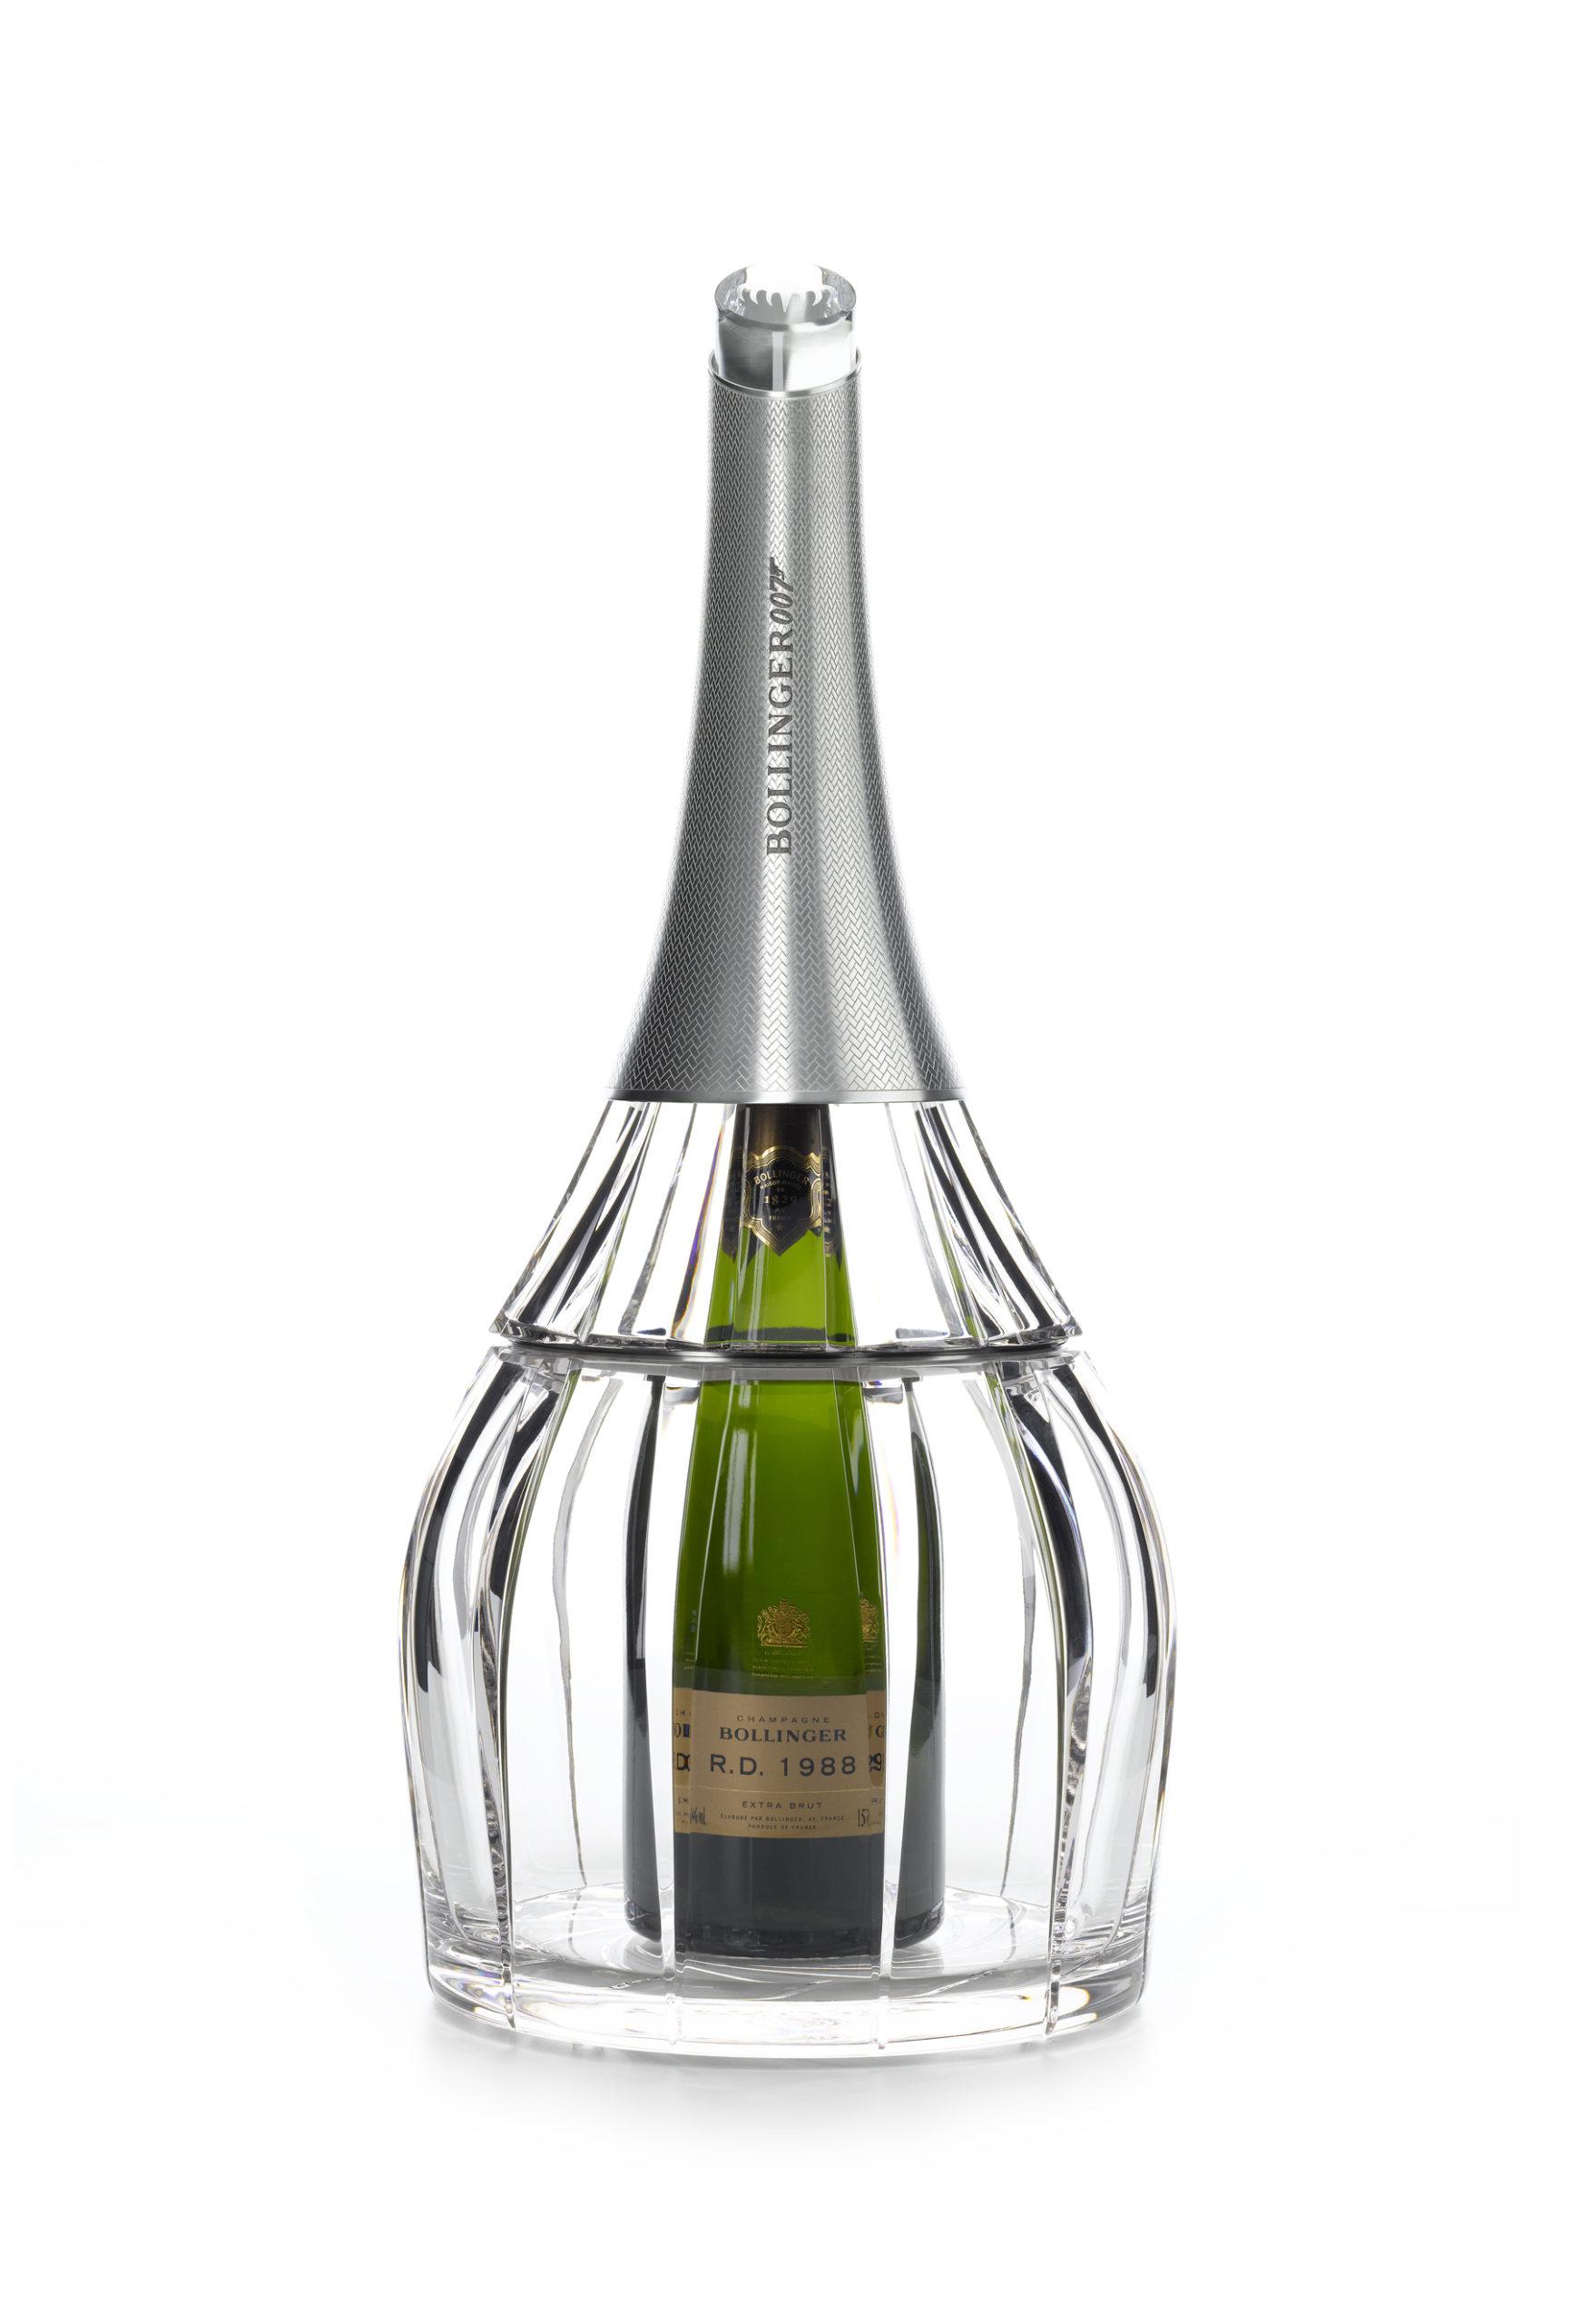 BOLLINGER_Cristal-Set_DESIGN-PRODUIT_Spiritueux-Champagne-James-Bond-Crystalerie-Saint-LouisPLANET-DESIGN-PARIS-Eric-Berthes_01-scaled.jpg